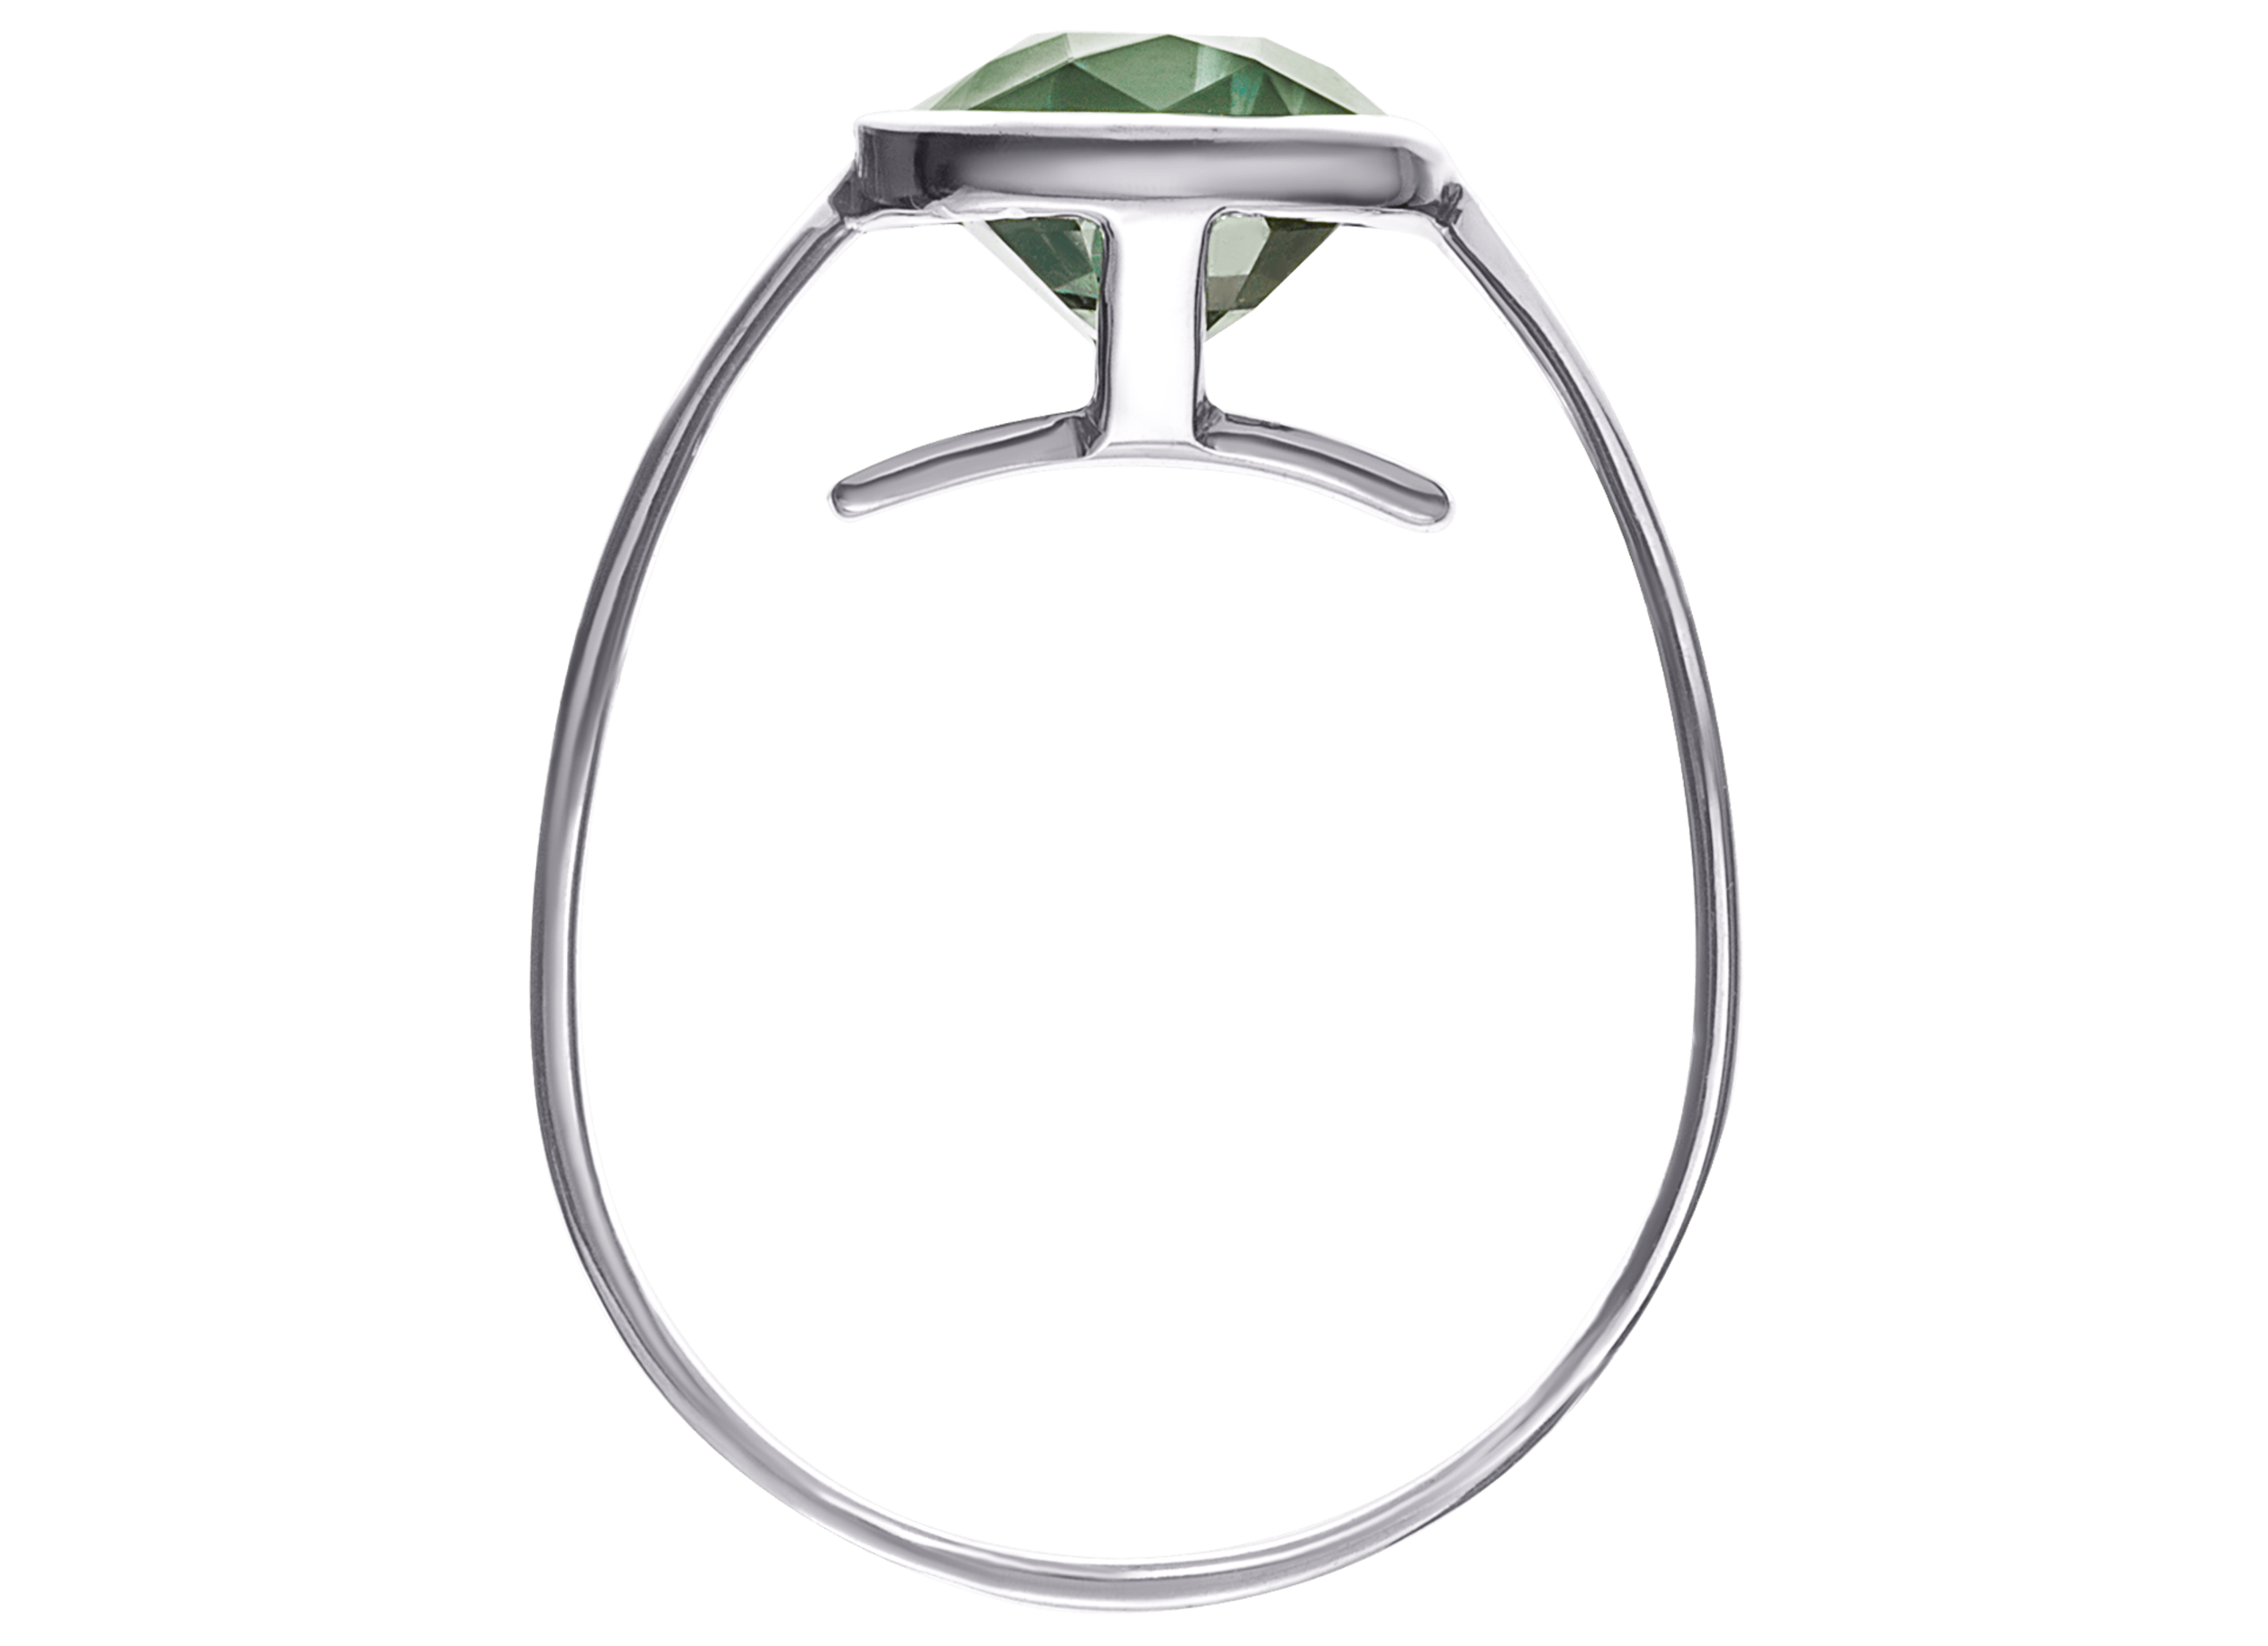 Bague Cha or blanc et Saphir vert coussin 3,01 carats web.png